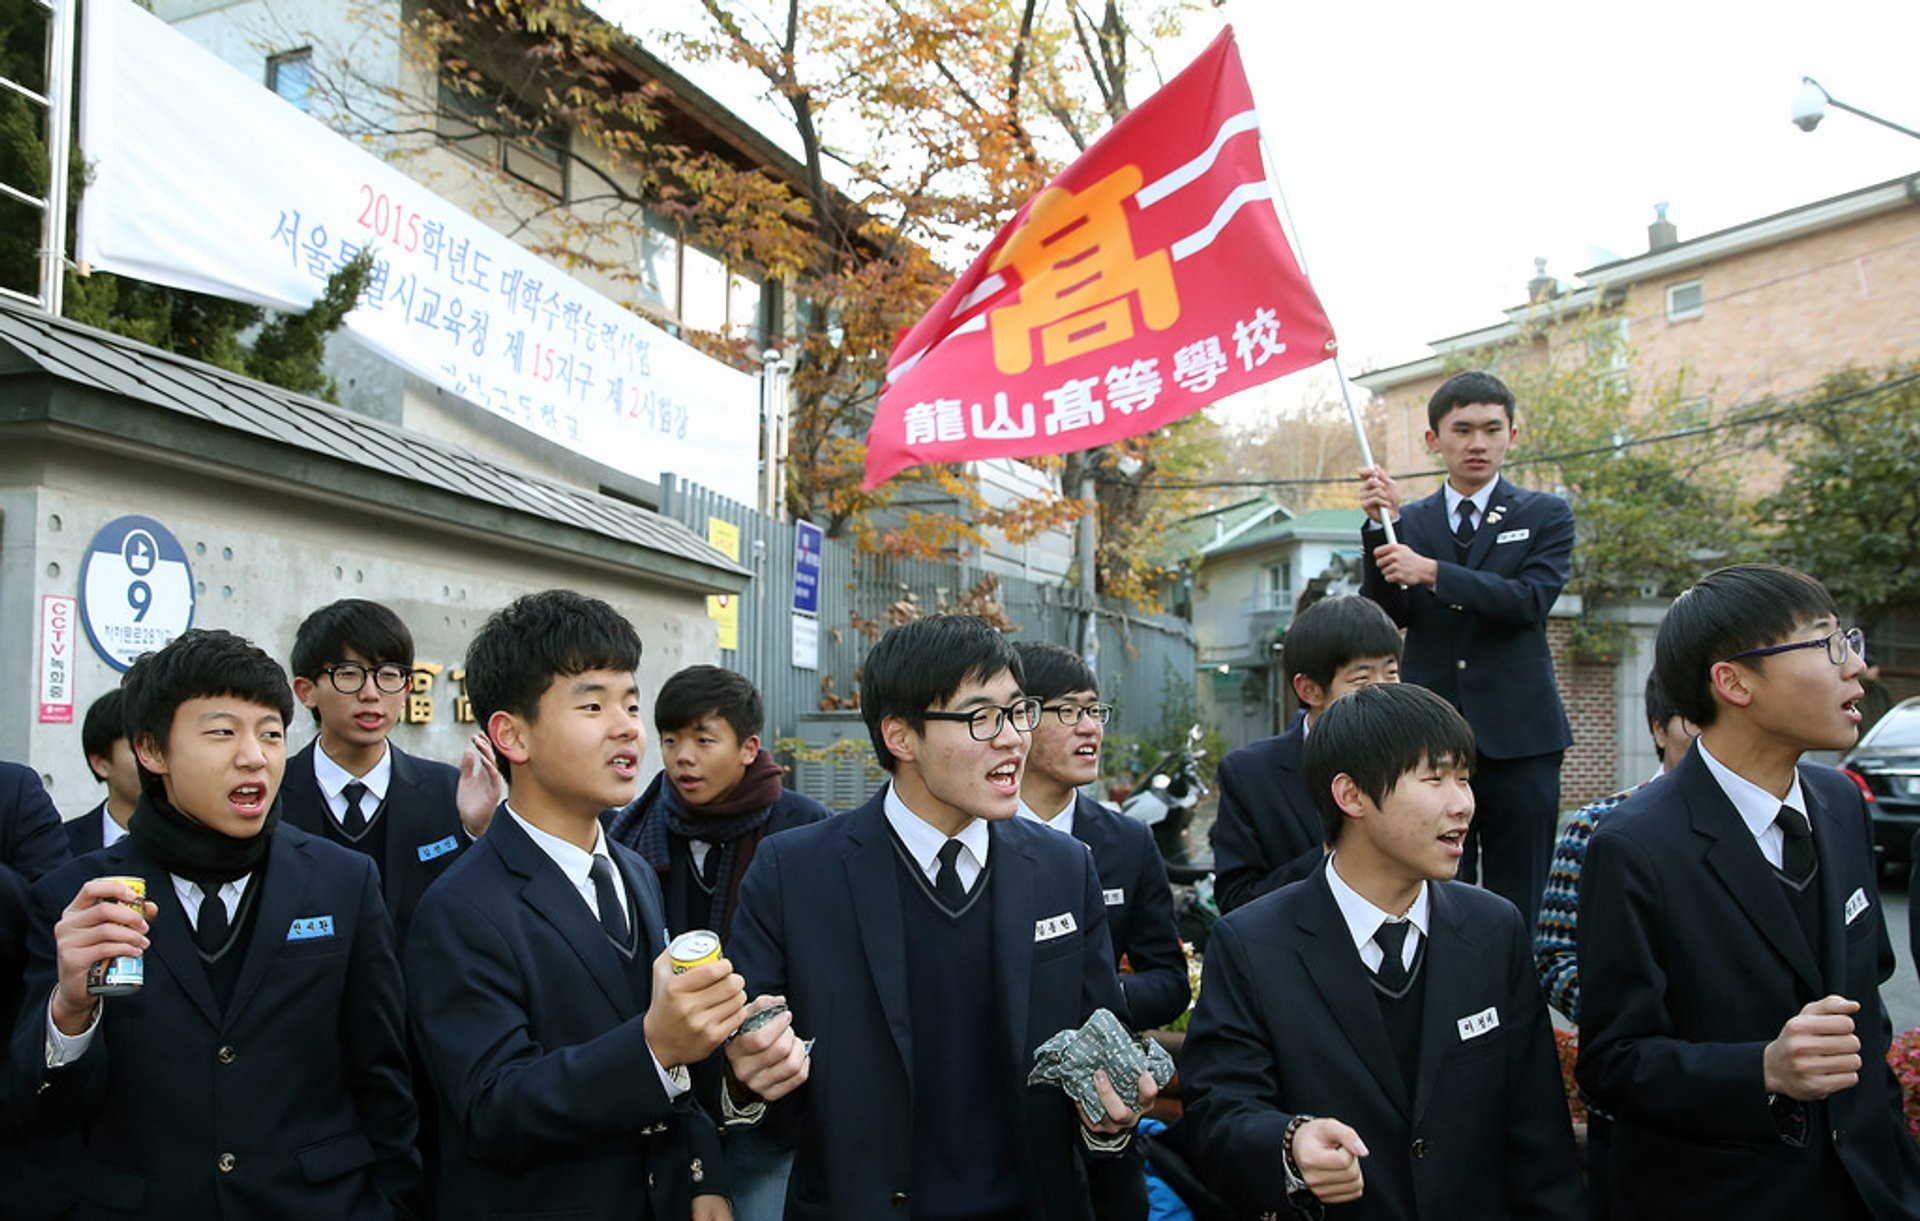 The College Scholastic Ability Test, Kyungbock High School, Jongno-gu, Seoul 2020